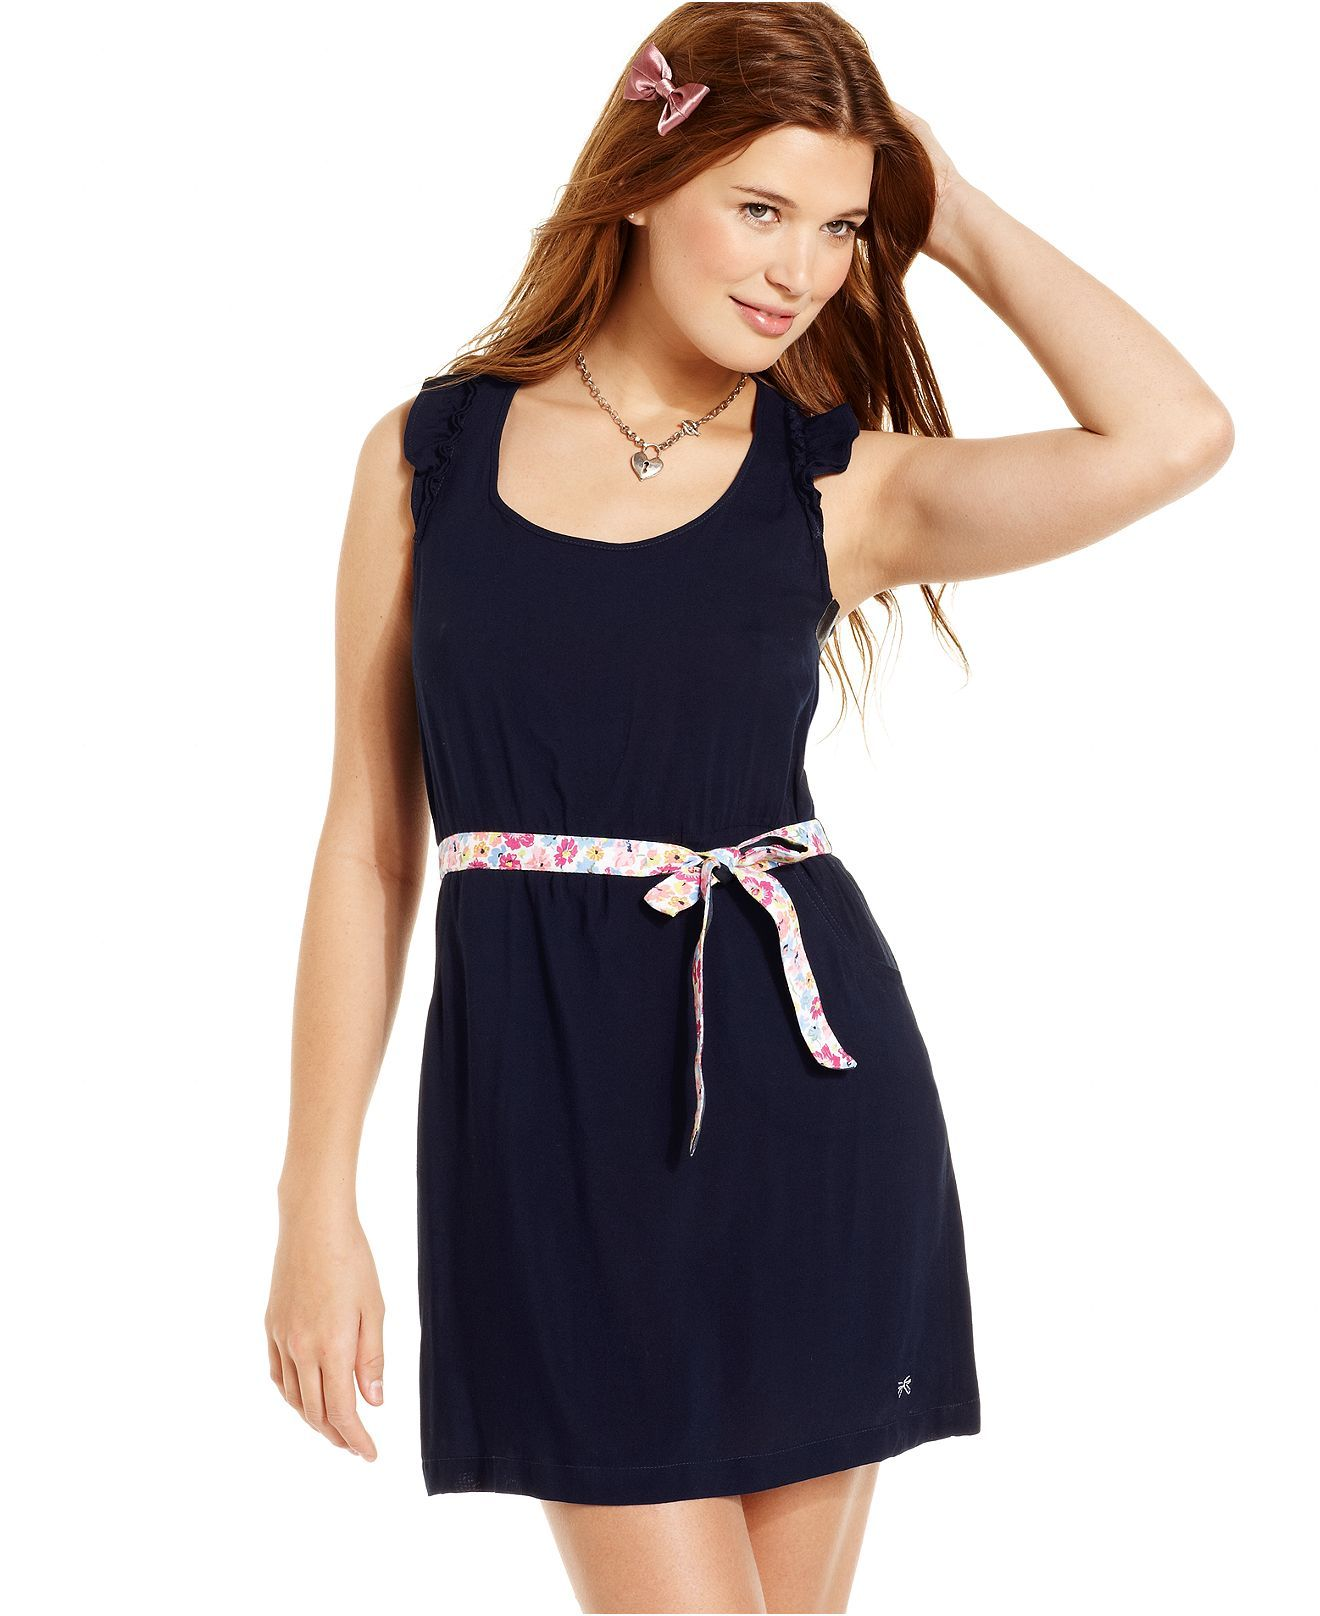 Tommy Girl Dress Sleeveless Ruffled Belted Juniors Dresses Macy S Junior Dresses Review Dresses Dresses [ 1616 x 1320 Pixel ]